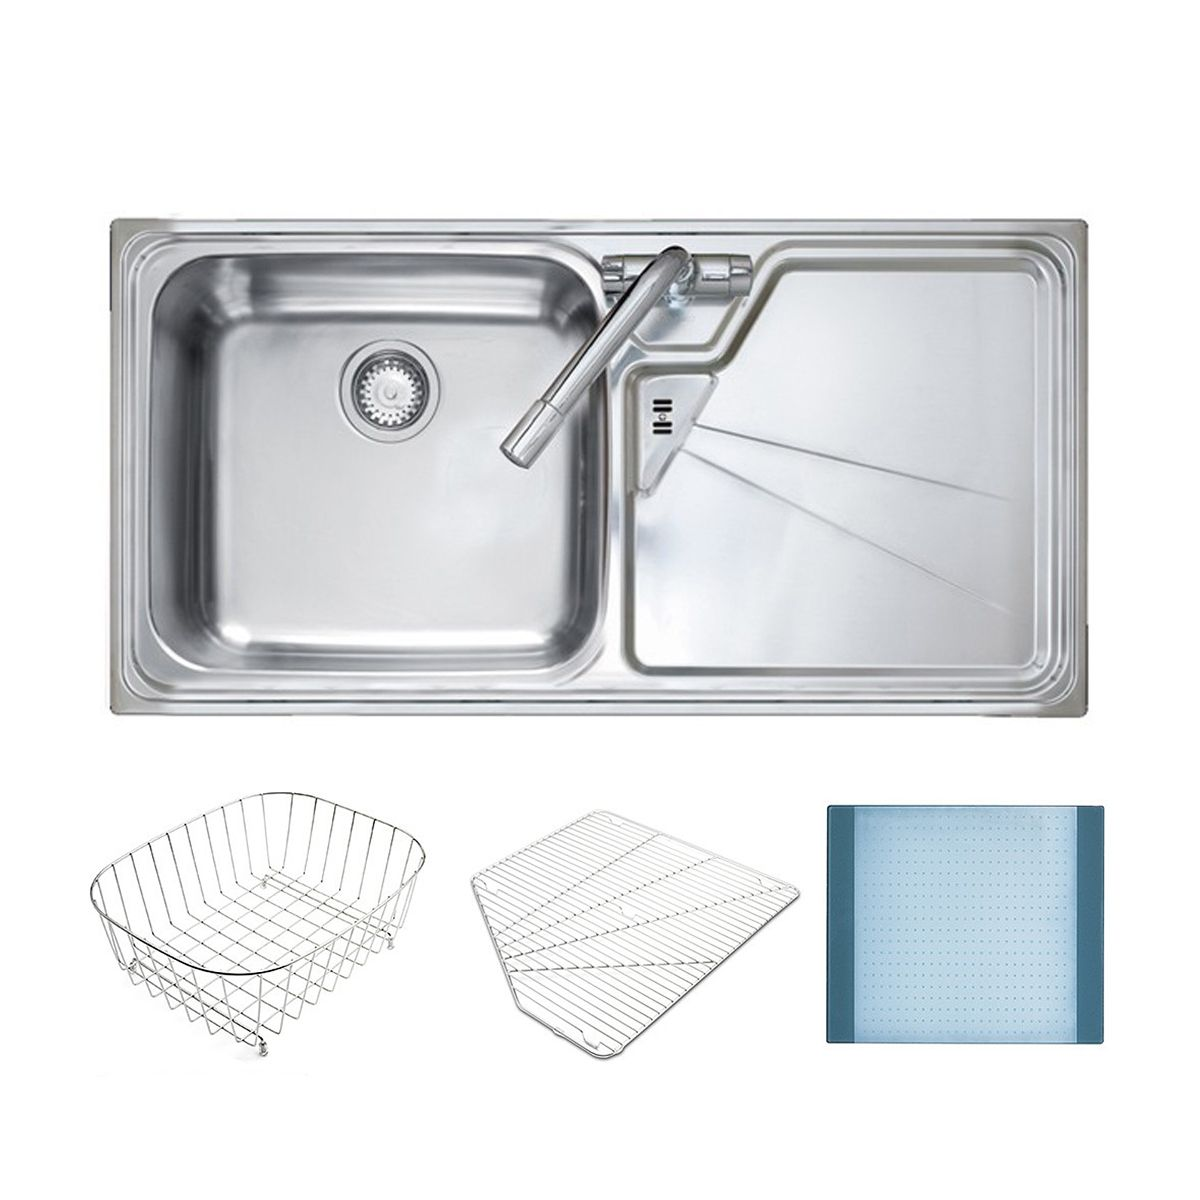 Lausanne 1 0 bowl sink w free accessories sinks - Stainless steel kitchen sink accessories ...